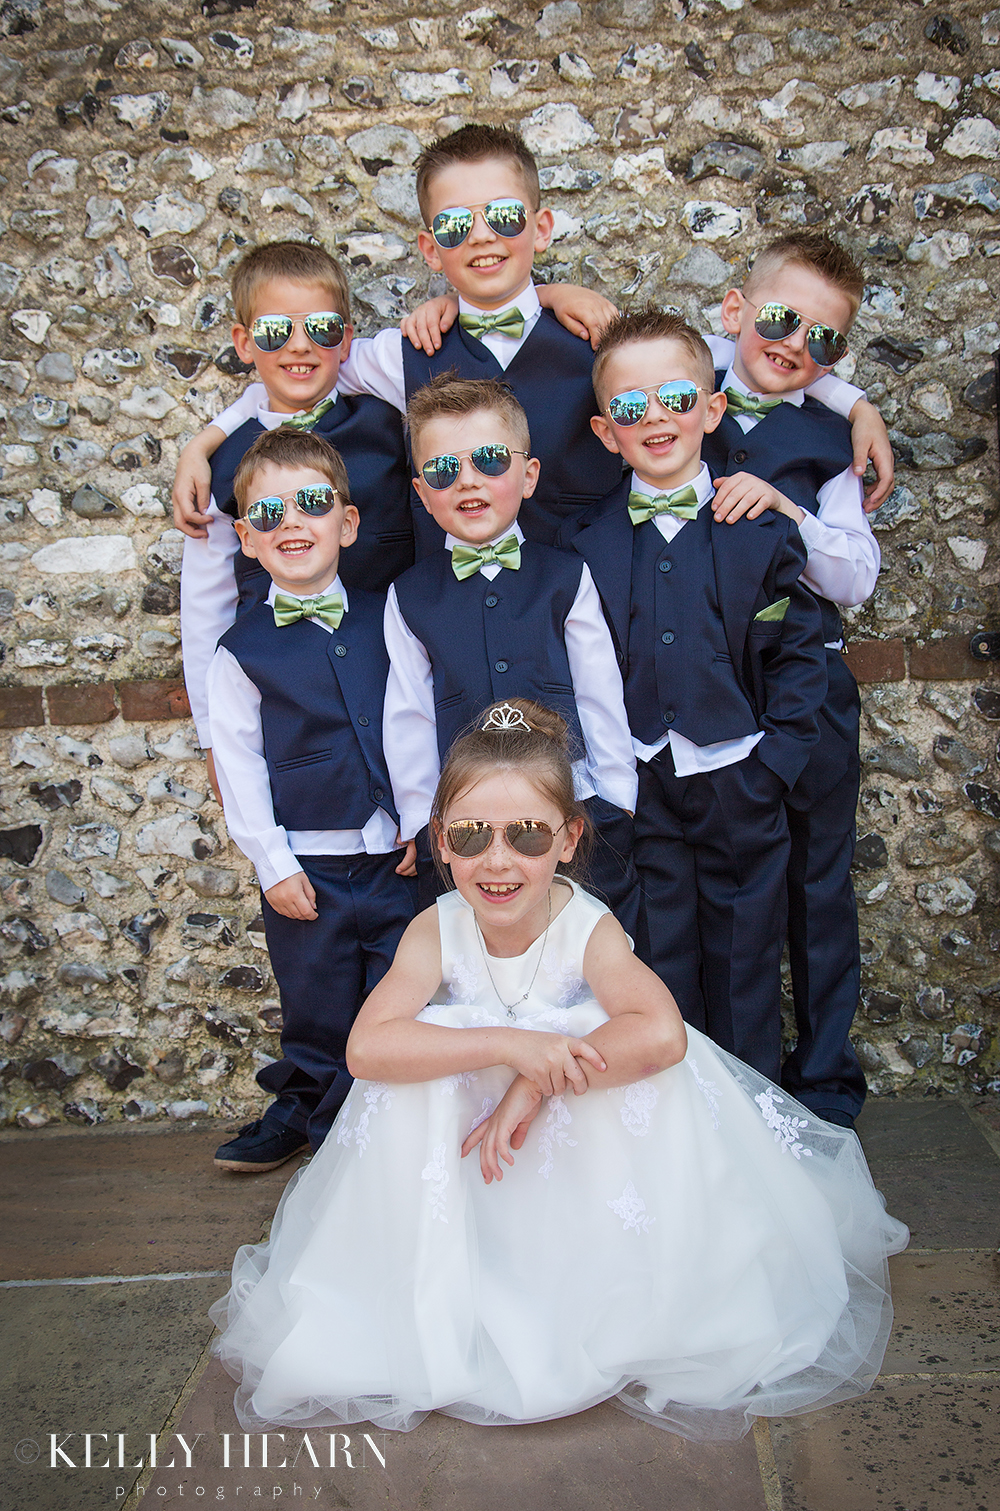 CAP_kids-in-glasses.jpg#asset:2056